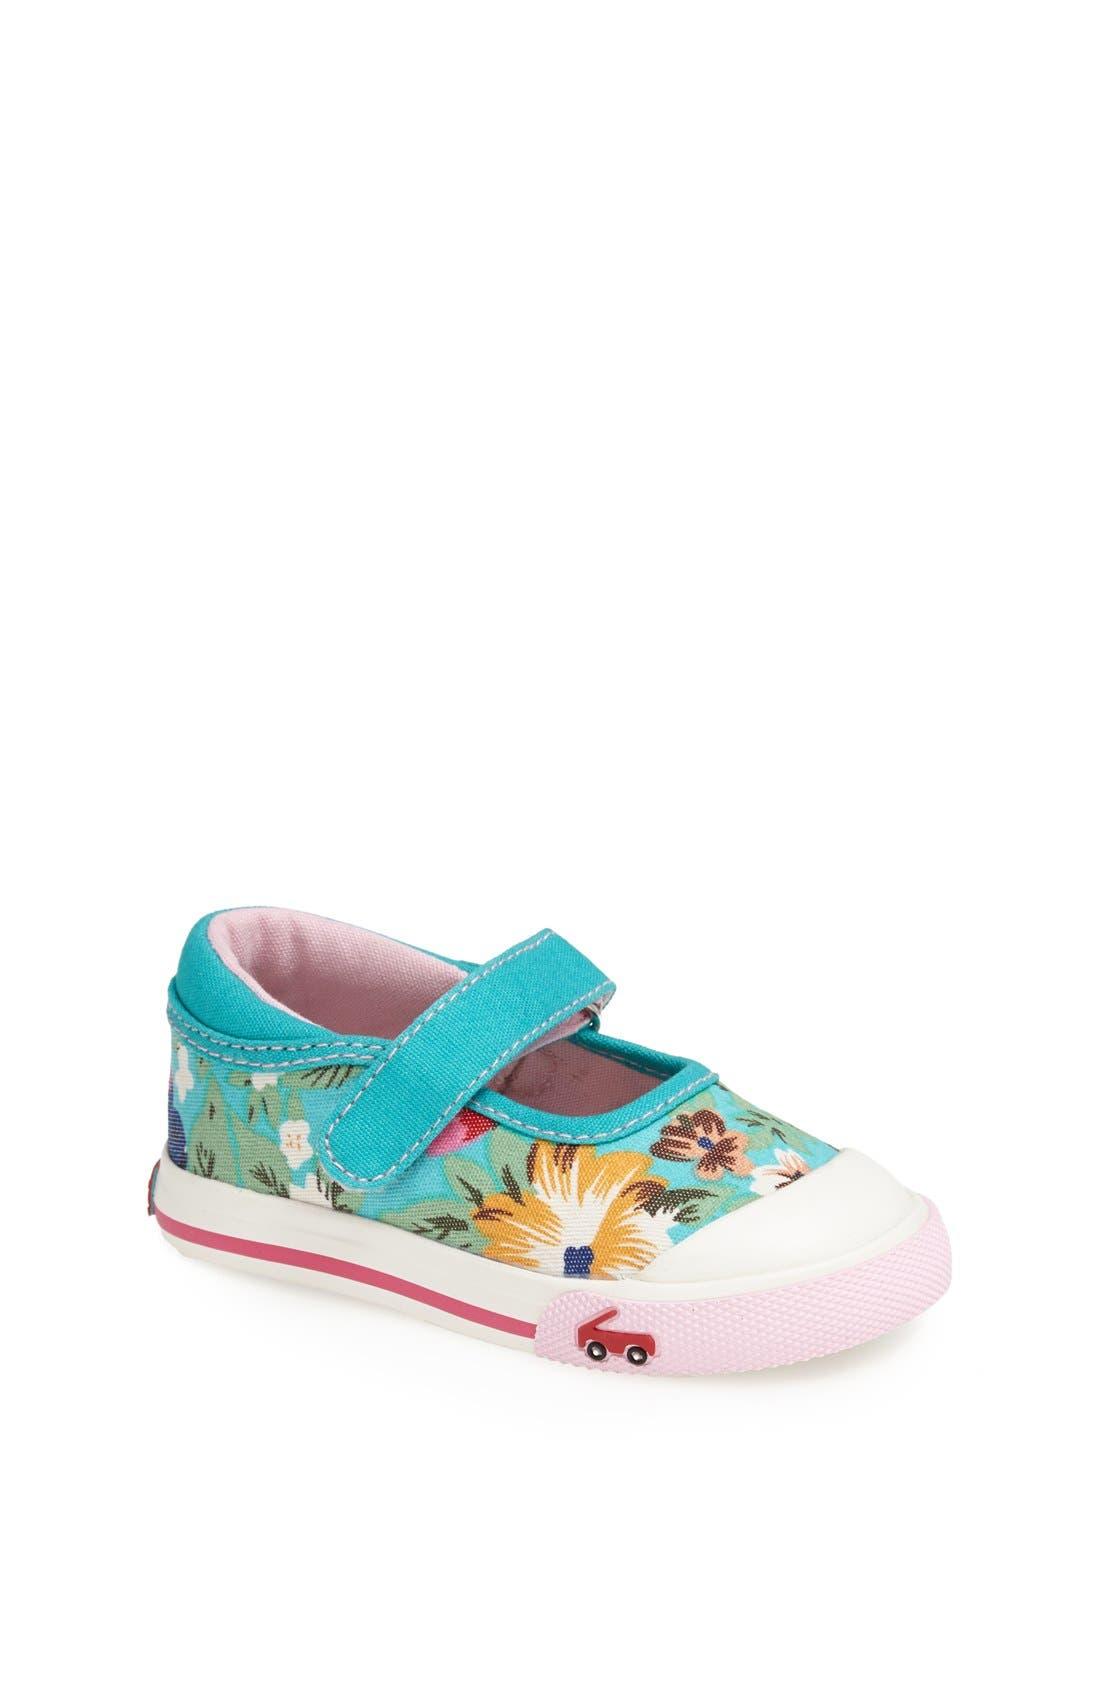 Main Image - See Kai Run 'Marie' Mary Jane Sneaker (Baby, Walker & Toddler)